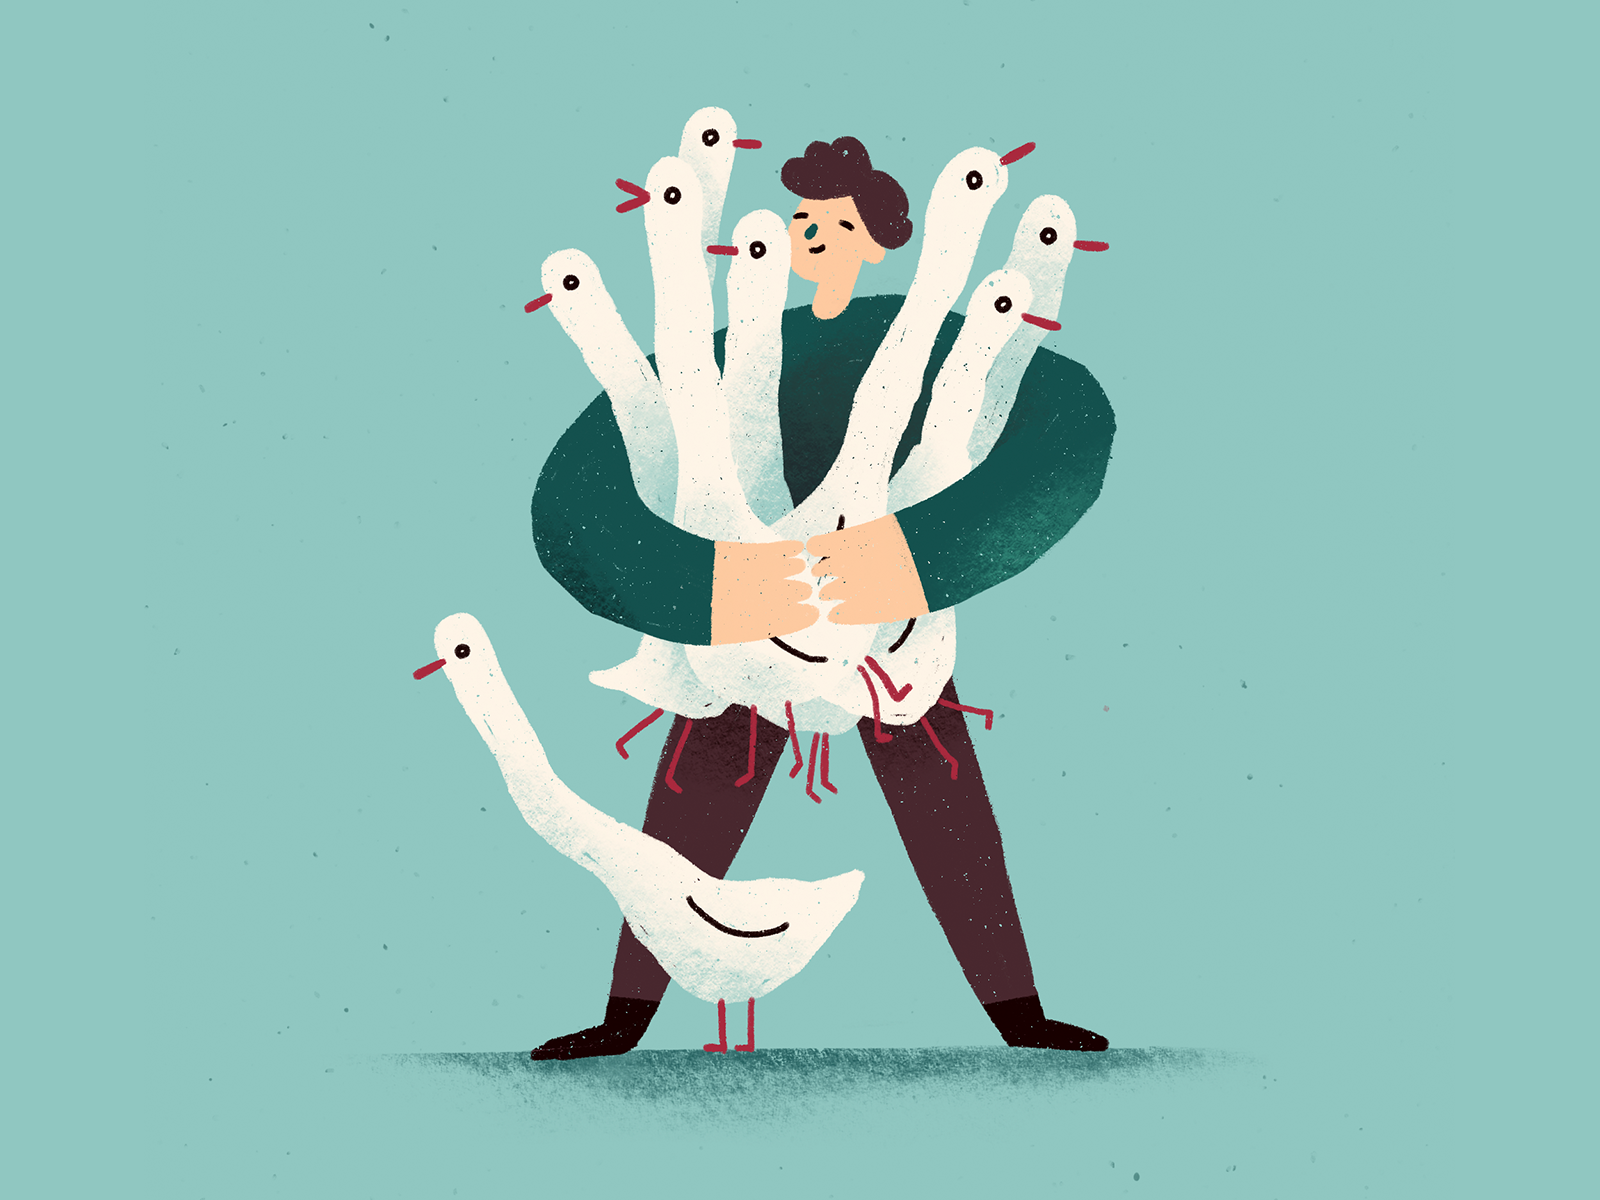 Geese hug